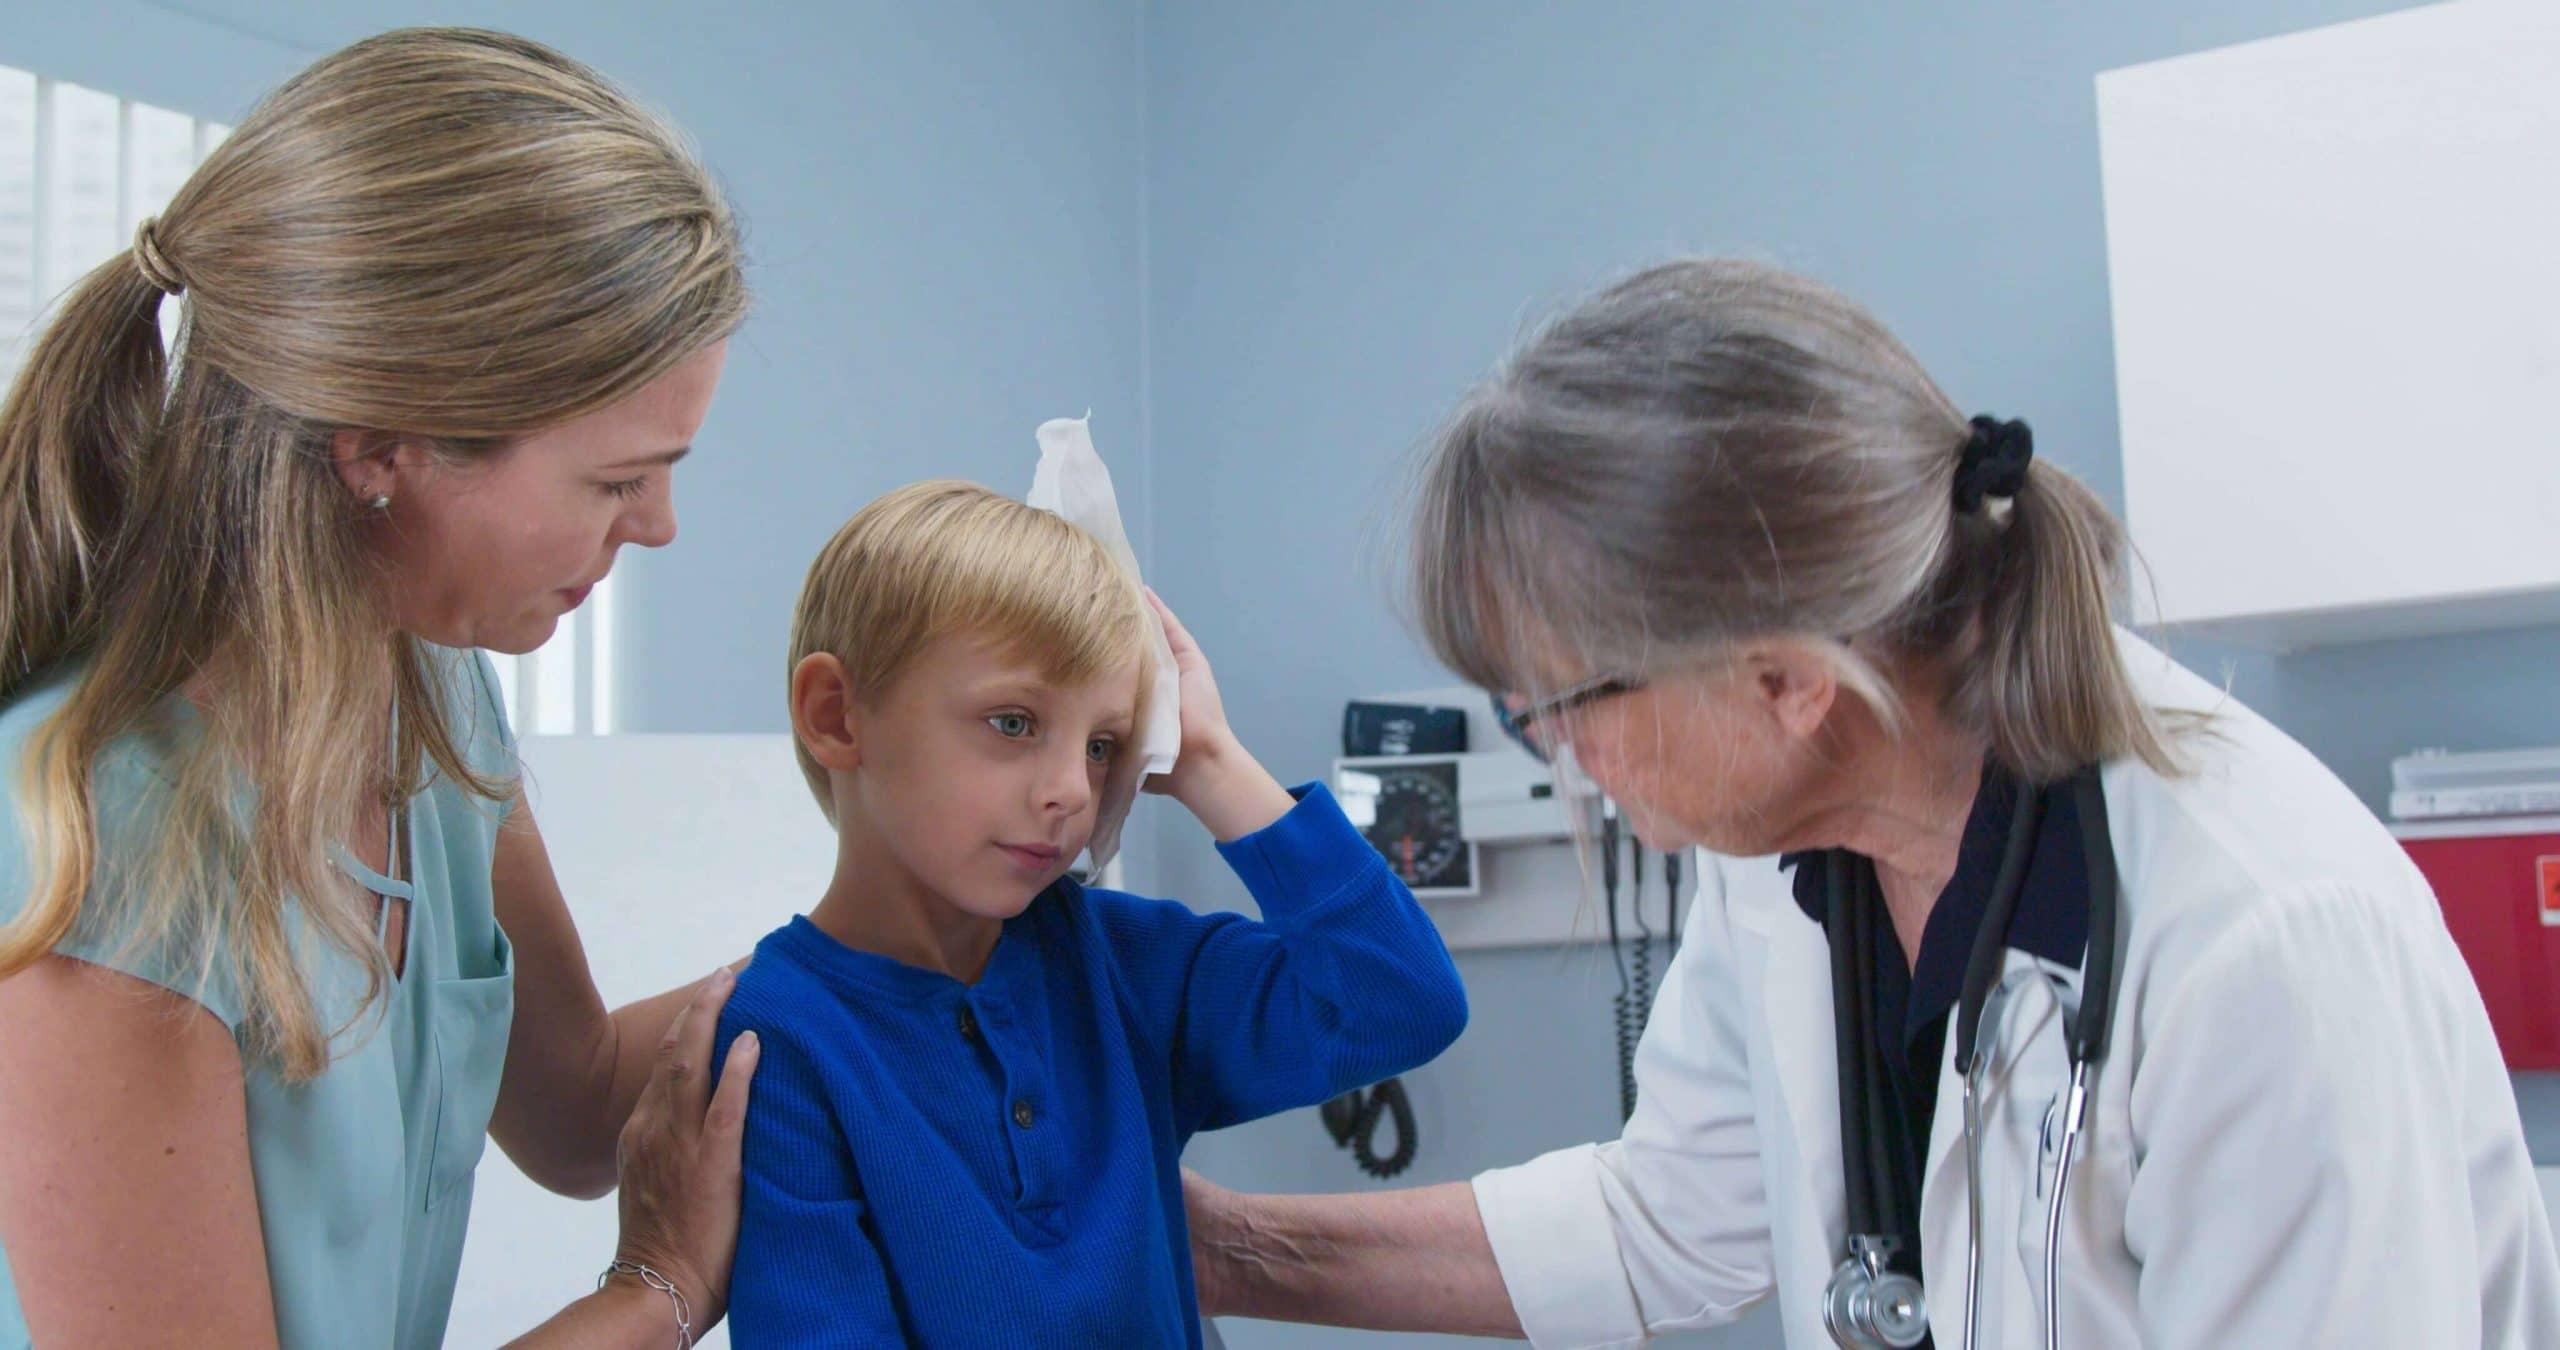 осмотр у невролога ребенка с травмой